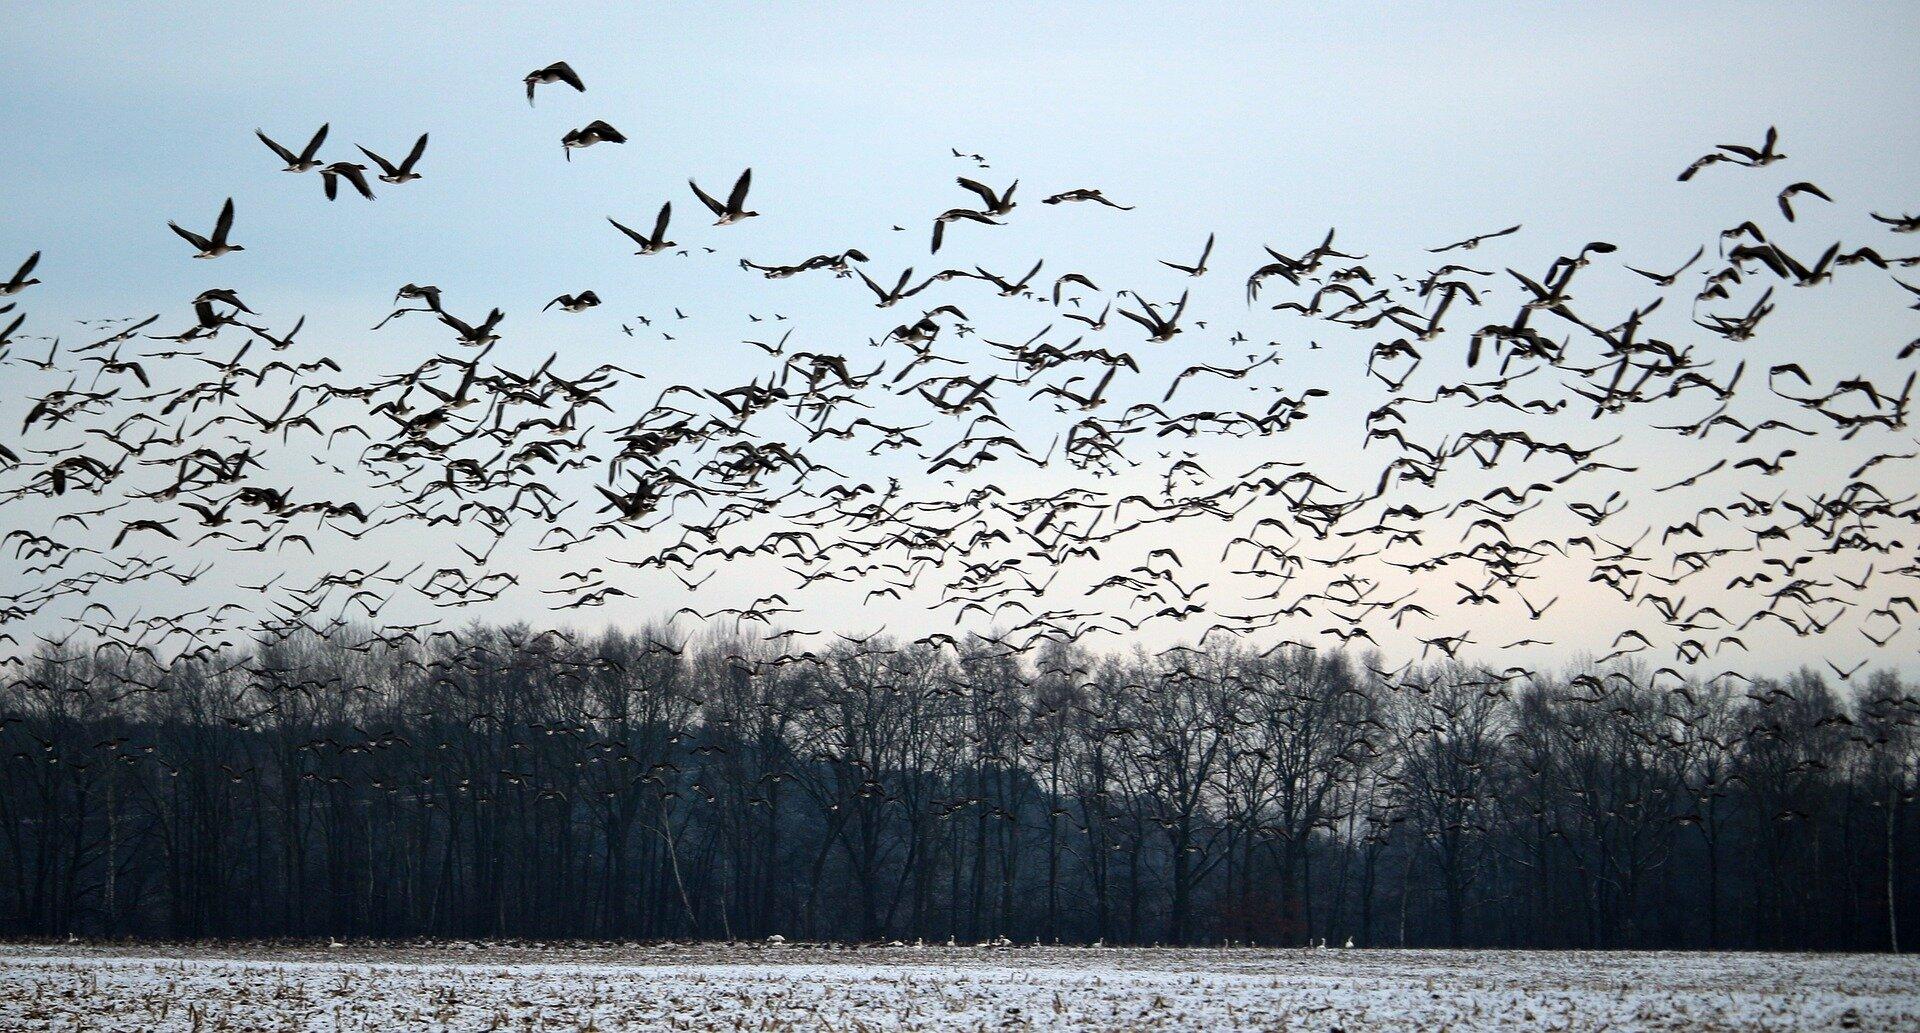 Predicting 50,000 years of bird migrations